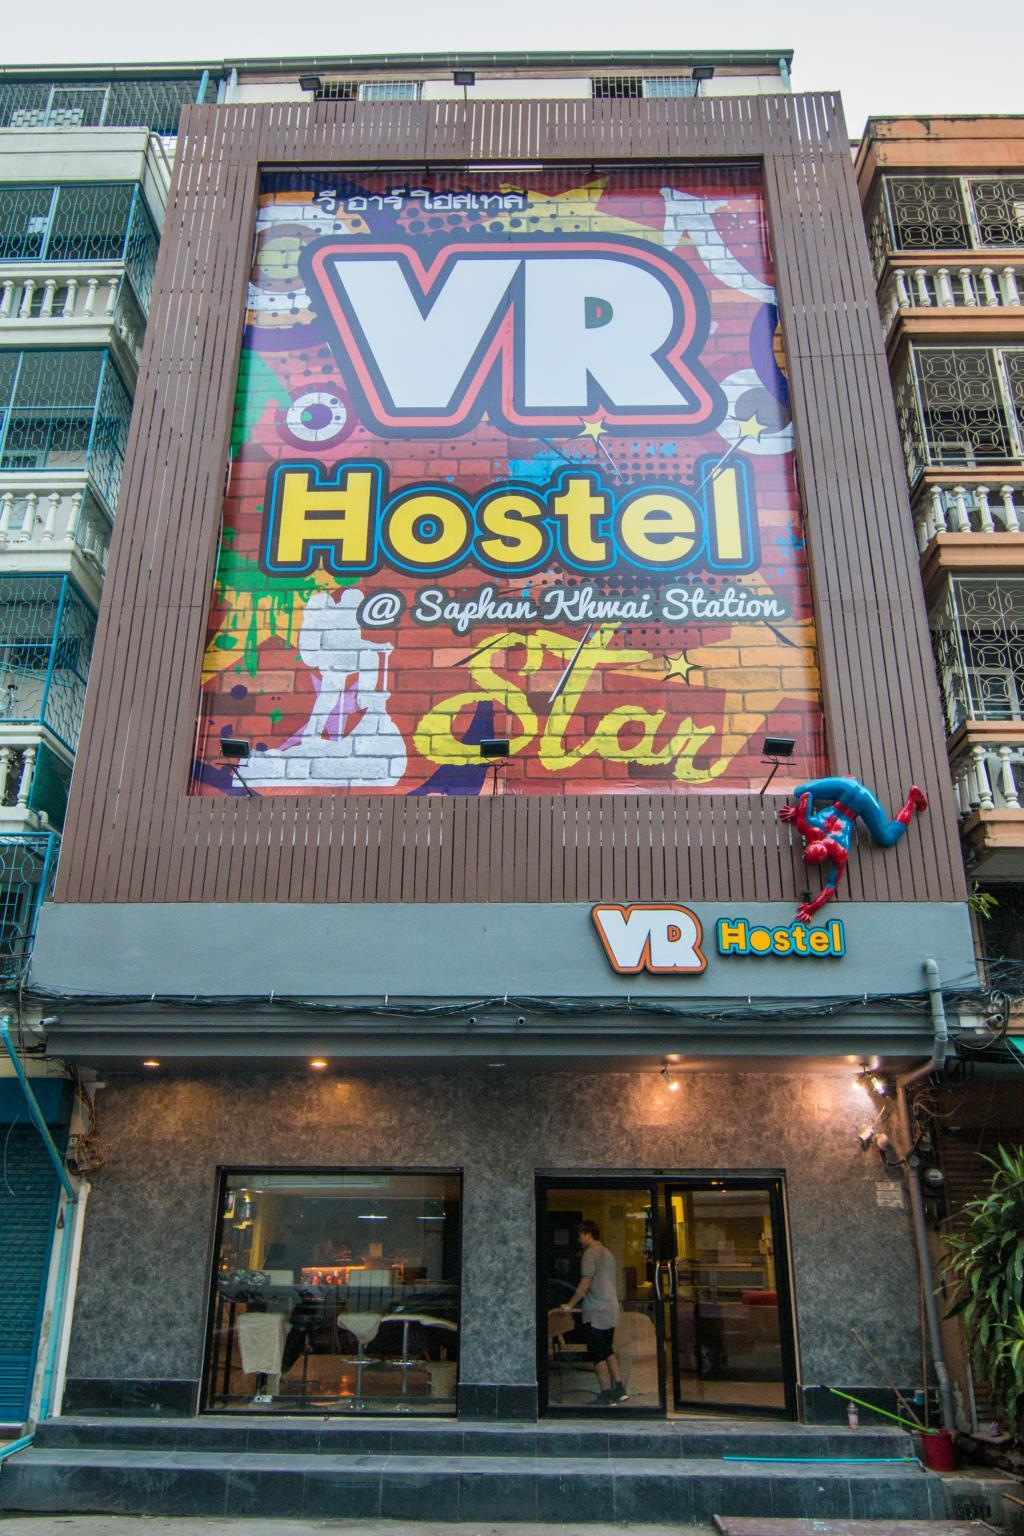 VR Hostel